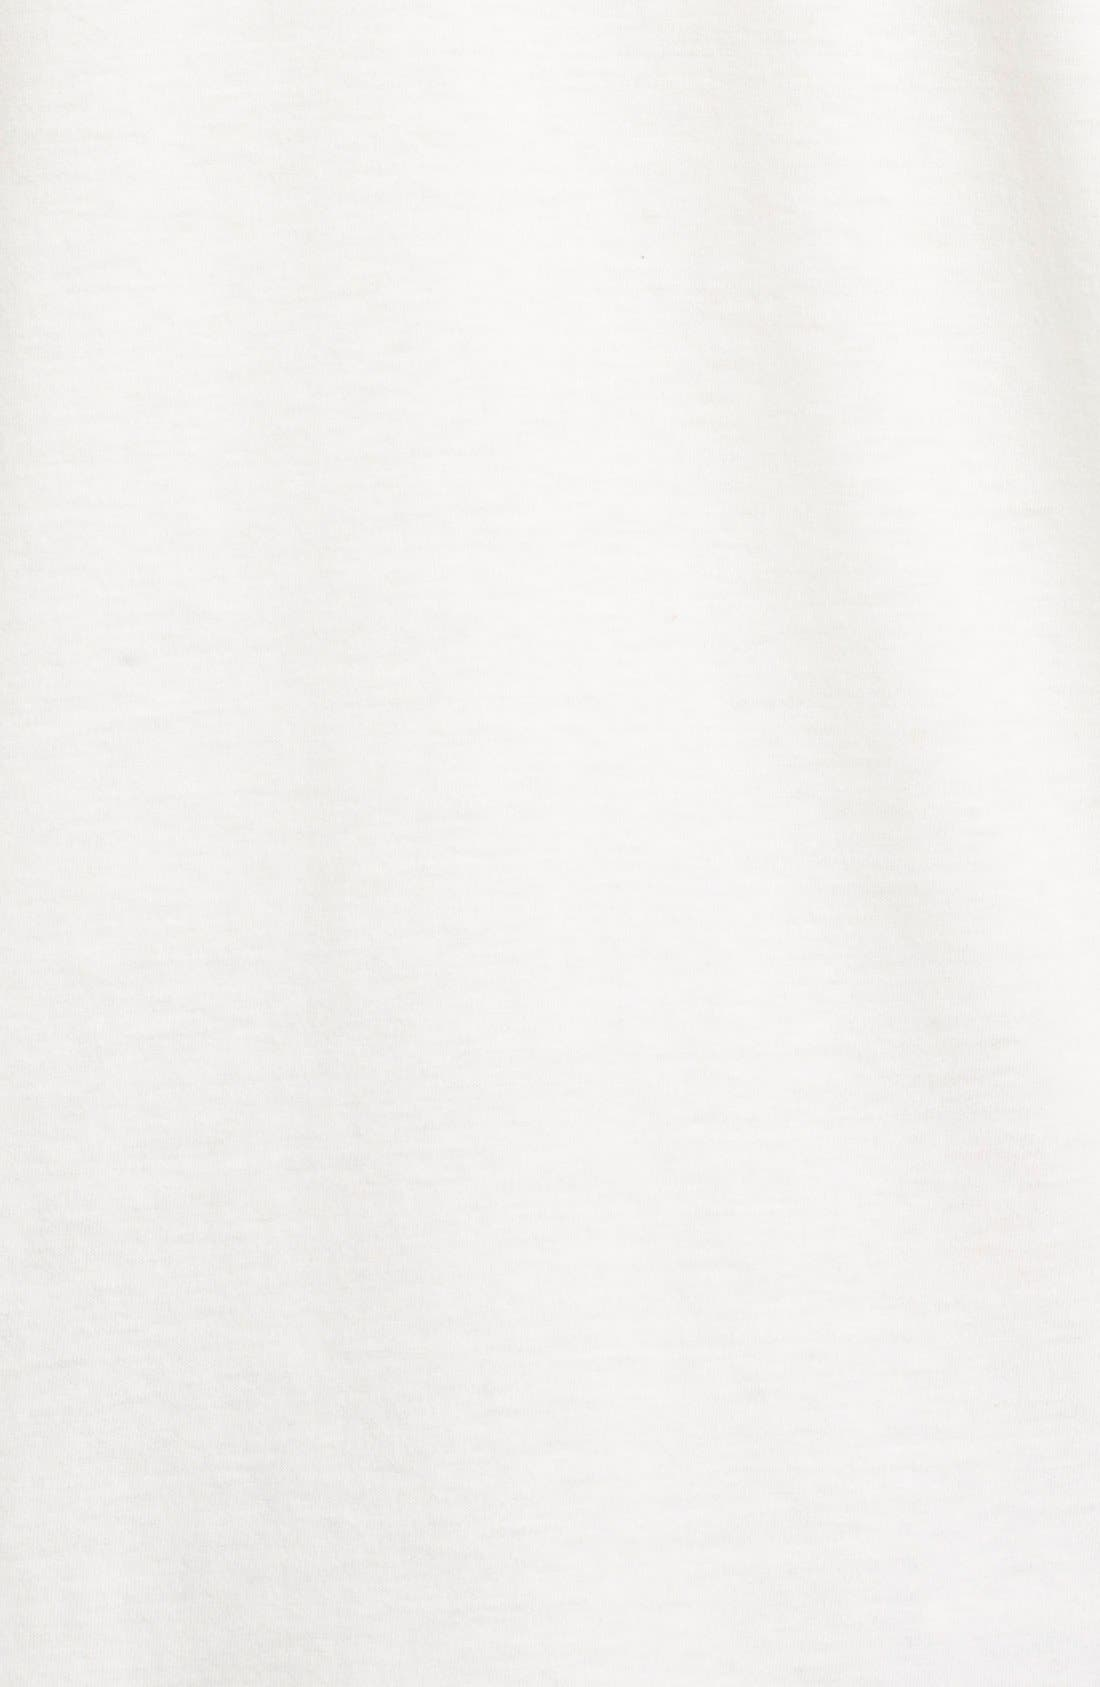 Alternate Image 3  - Moschino Teddy Print Cotton Tee